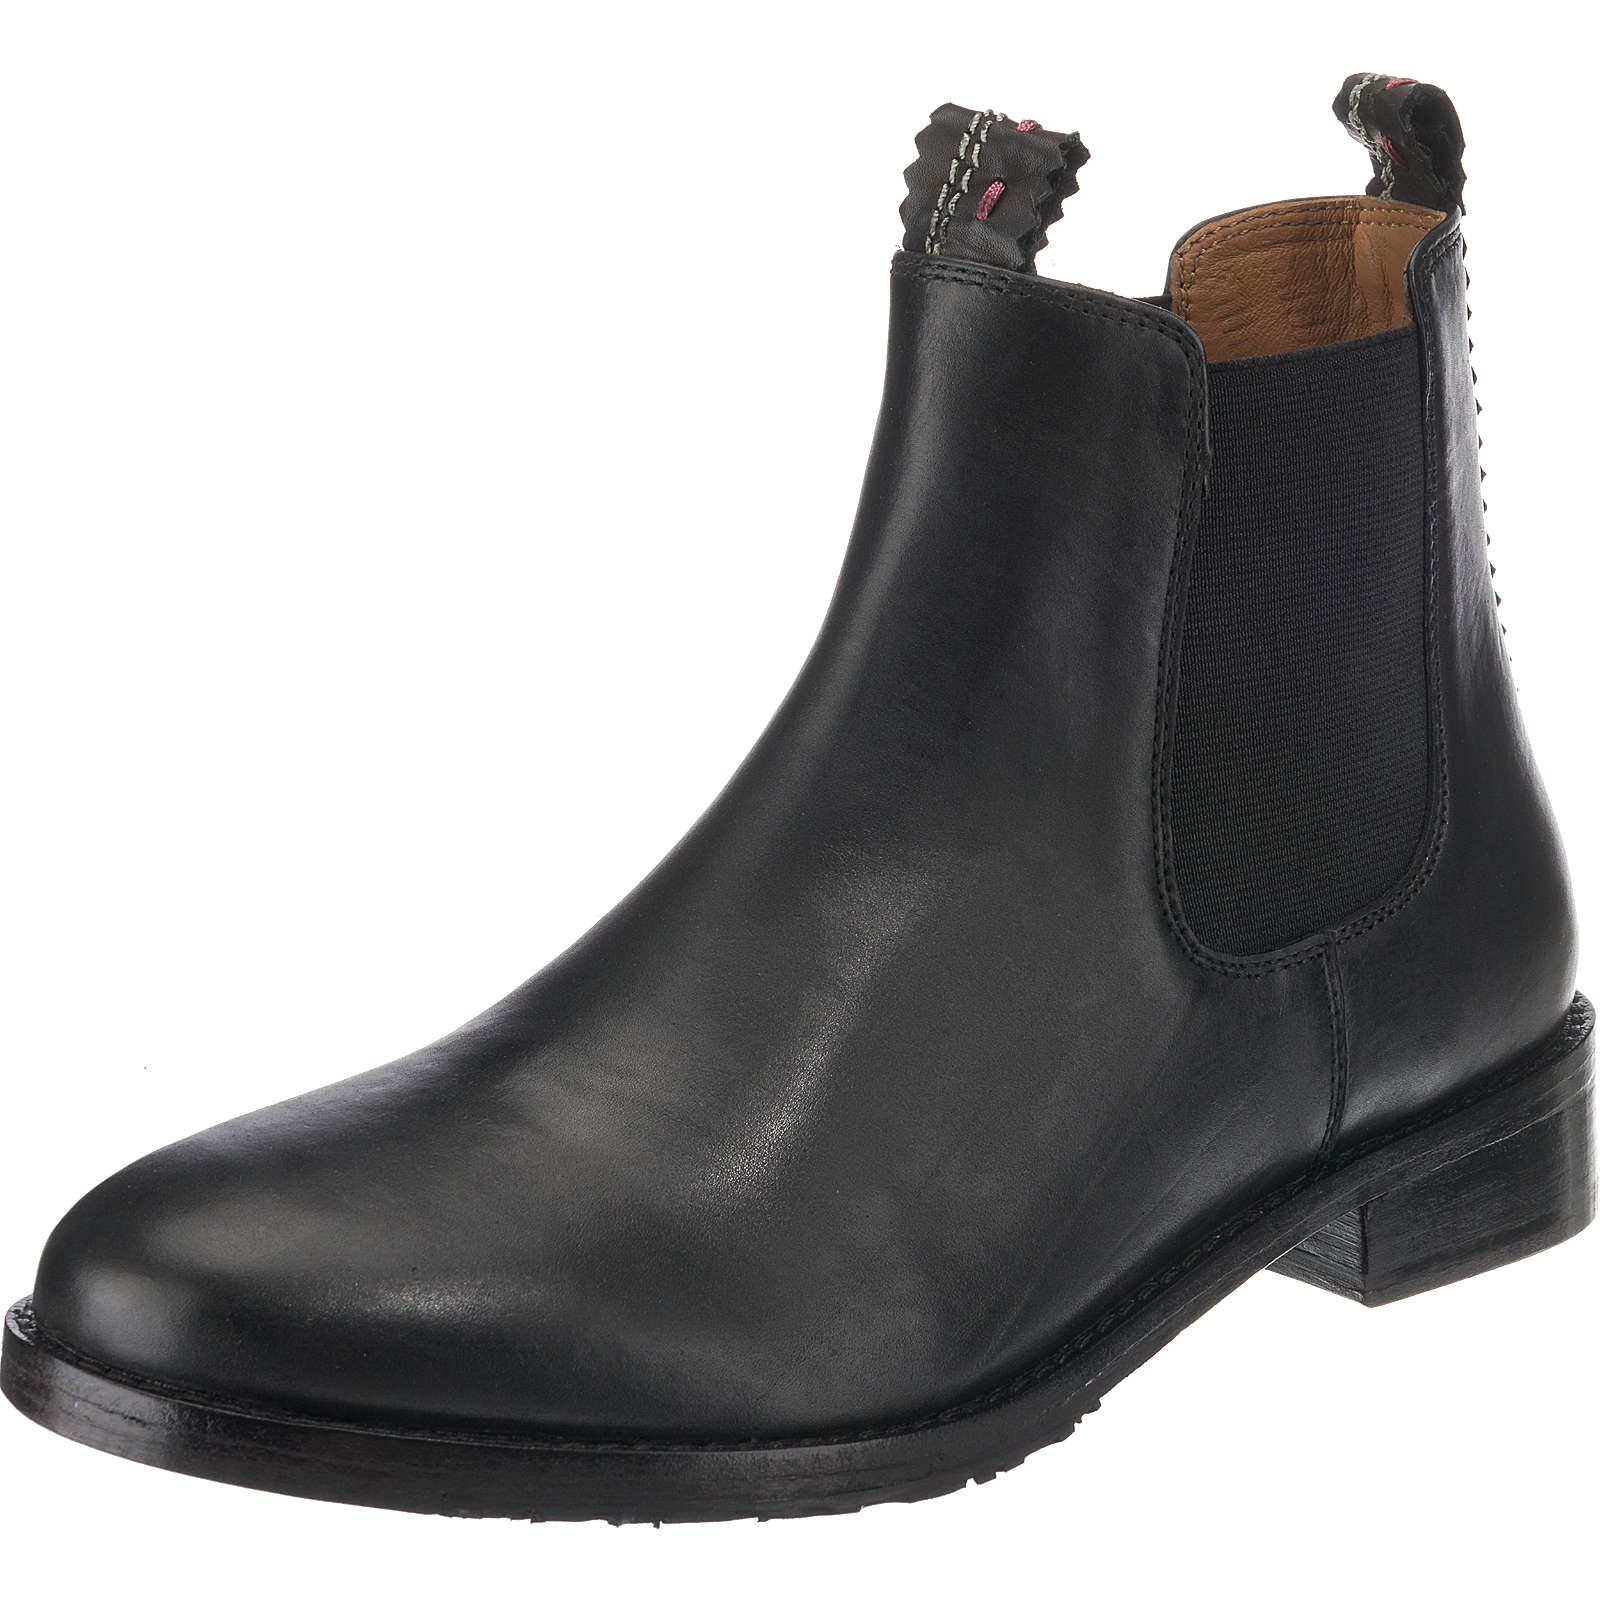 CRICKIT Torrente bolivia Chelsea Boots schwarz Damen Gr. 37